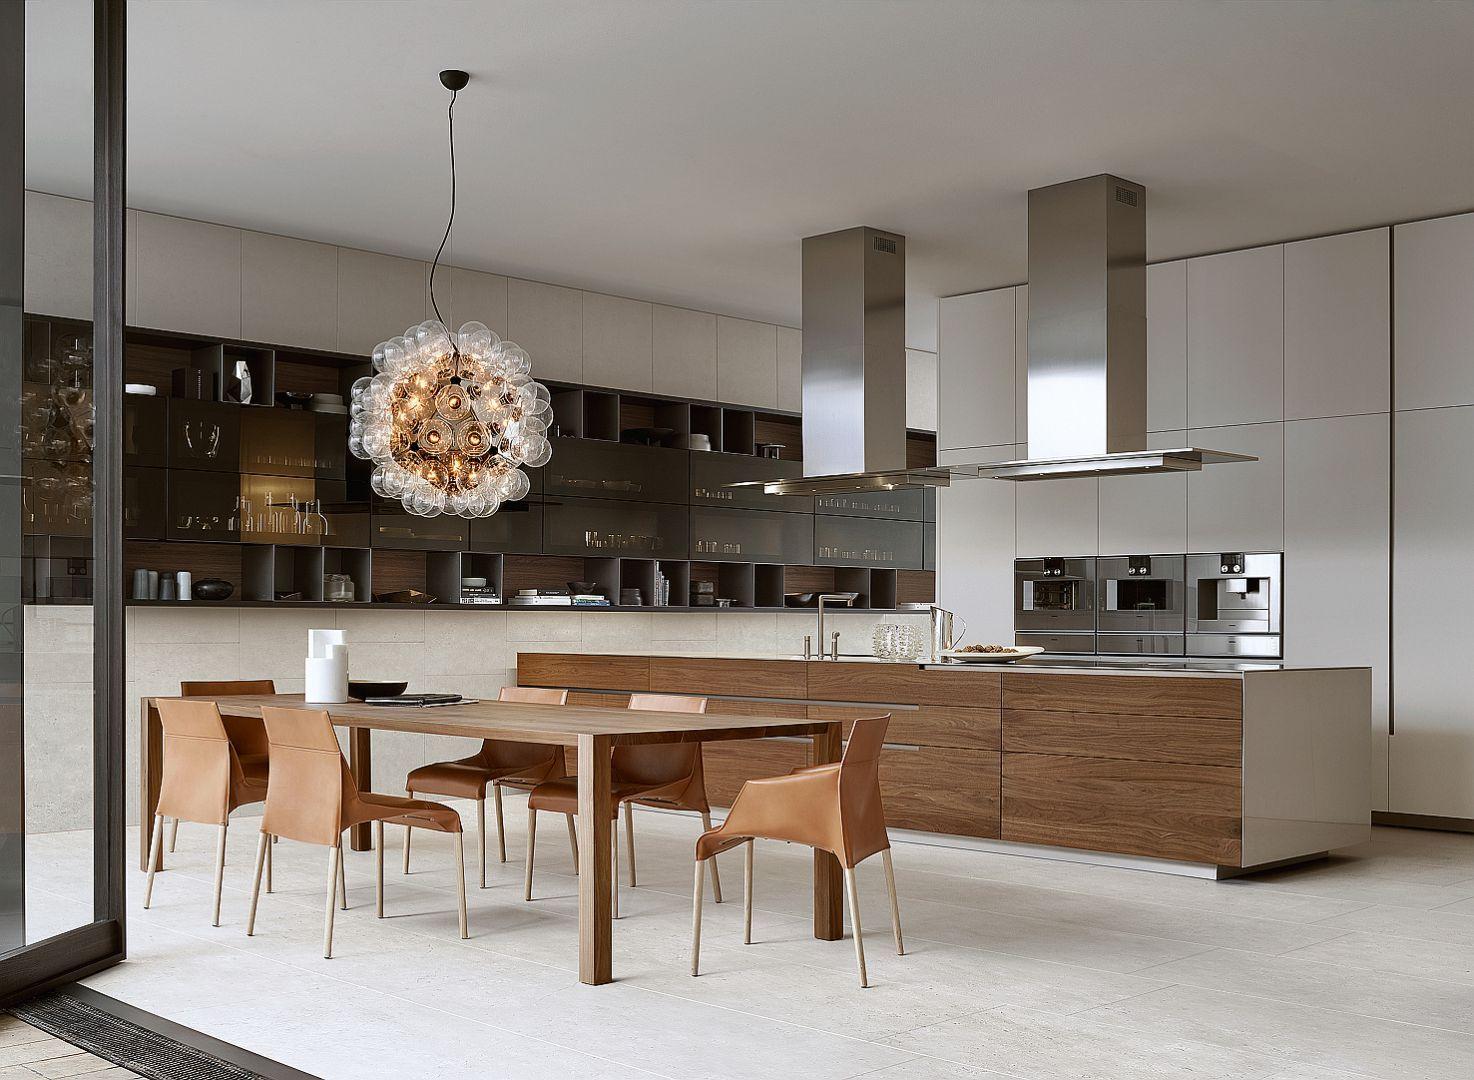 Kuchnia Polaczona Z Jadalnia Fot Poliform Varenna Kitchen Design Kitchen Dinning Room Kitchen Interior